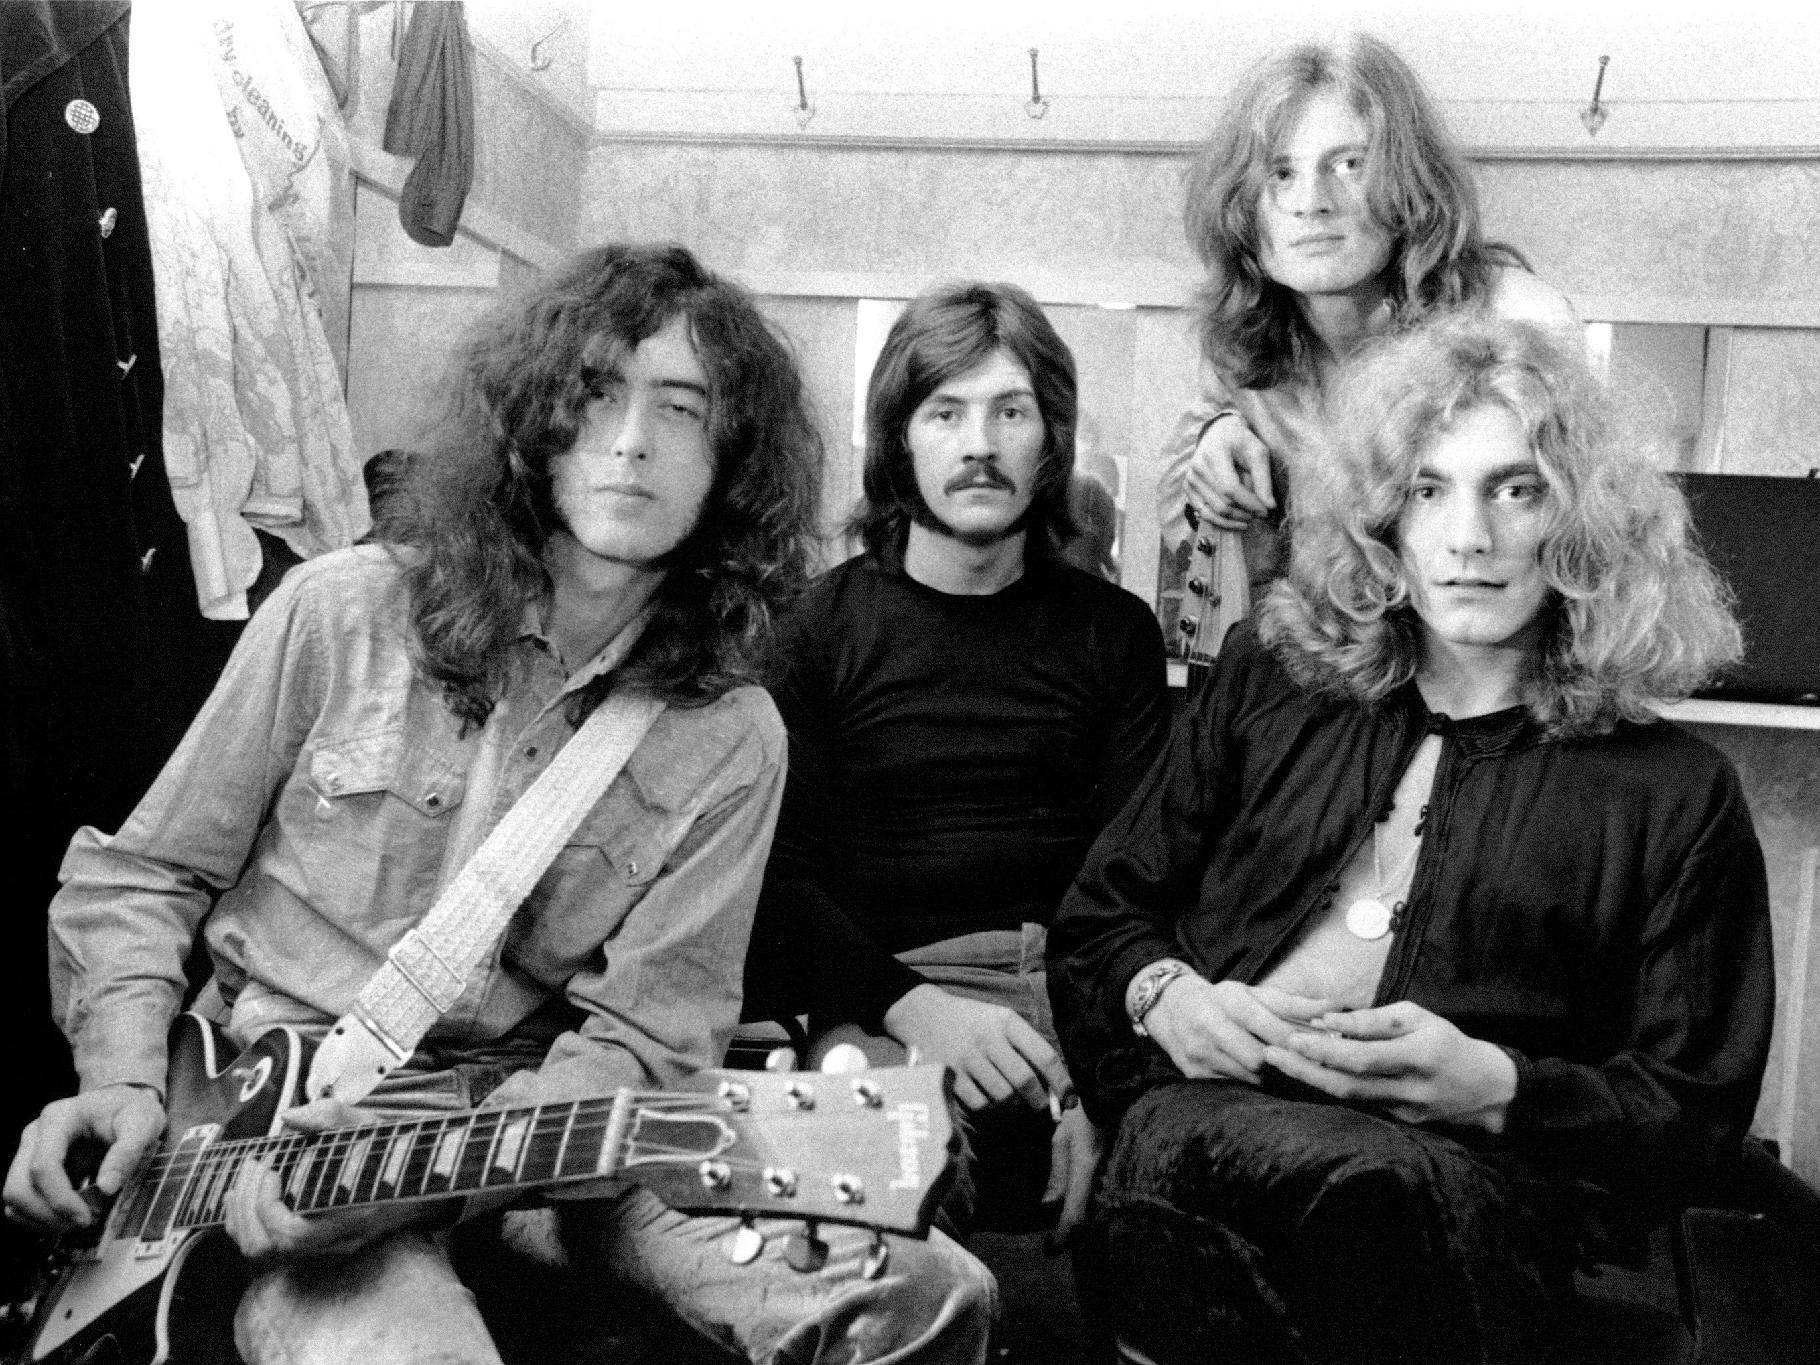 Led_Zeppelin_1968_photo_1